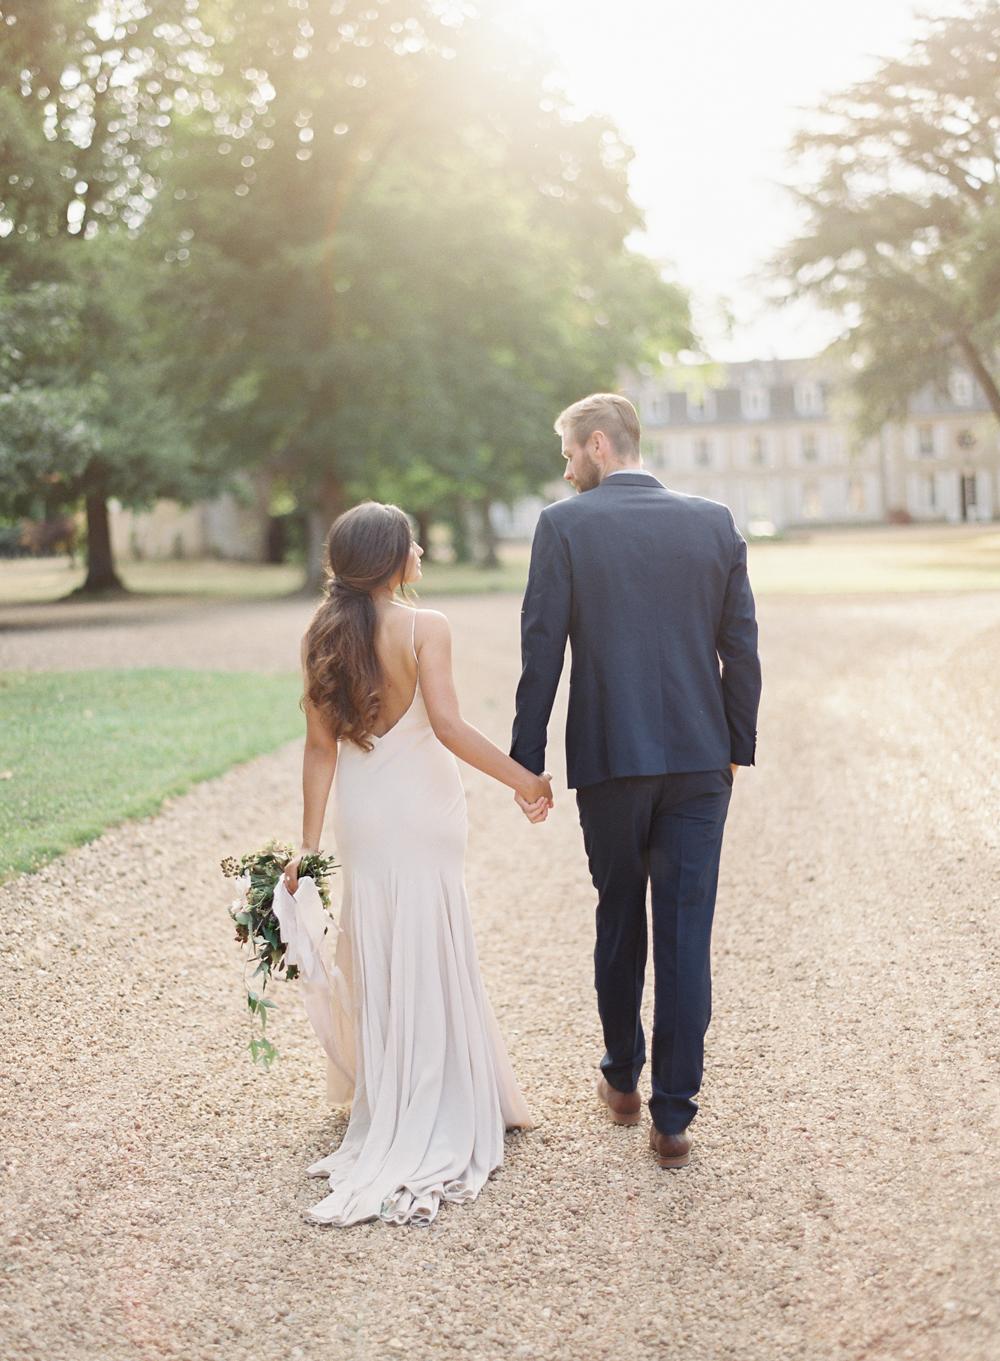 Vicki Grafton Photography Paris France Chateau wedding  Film Wedding photographer -1-3.jpg